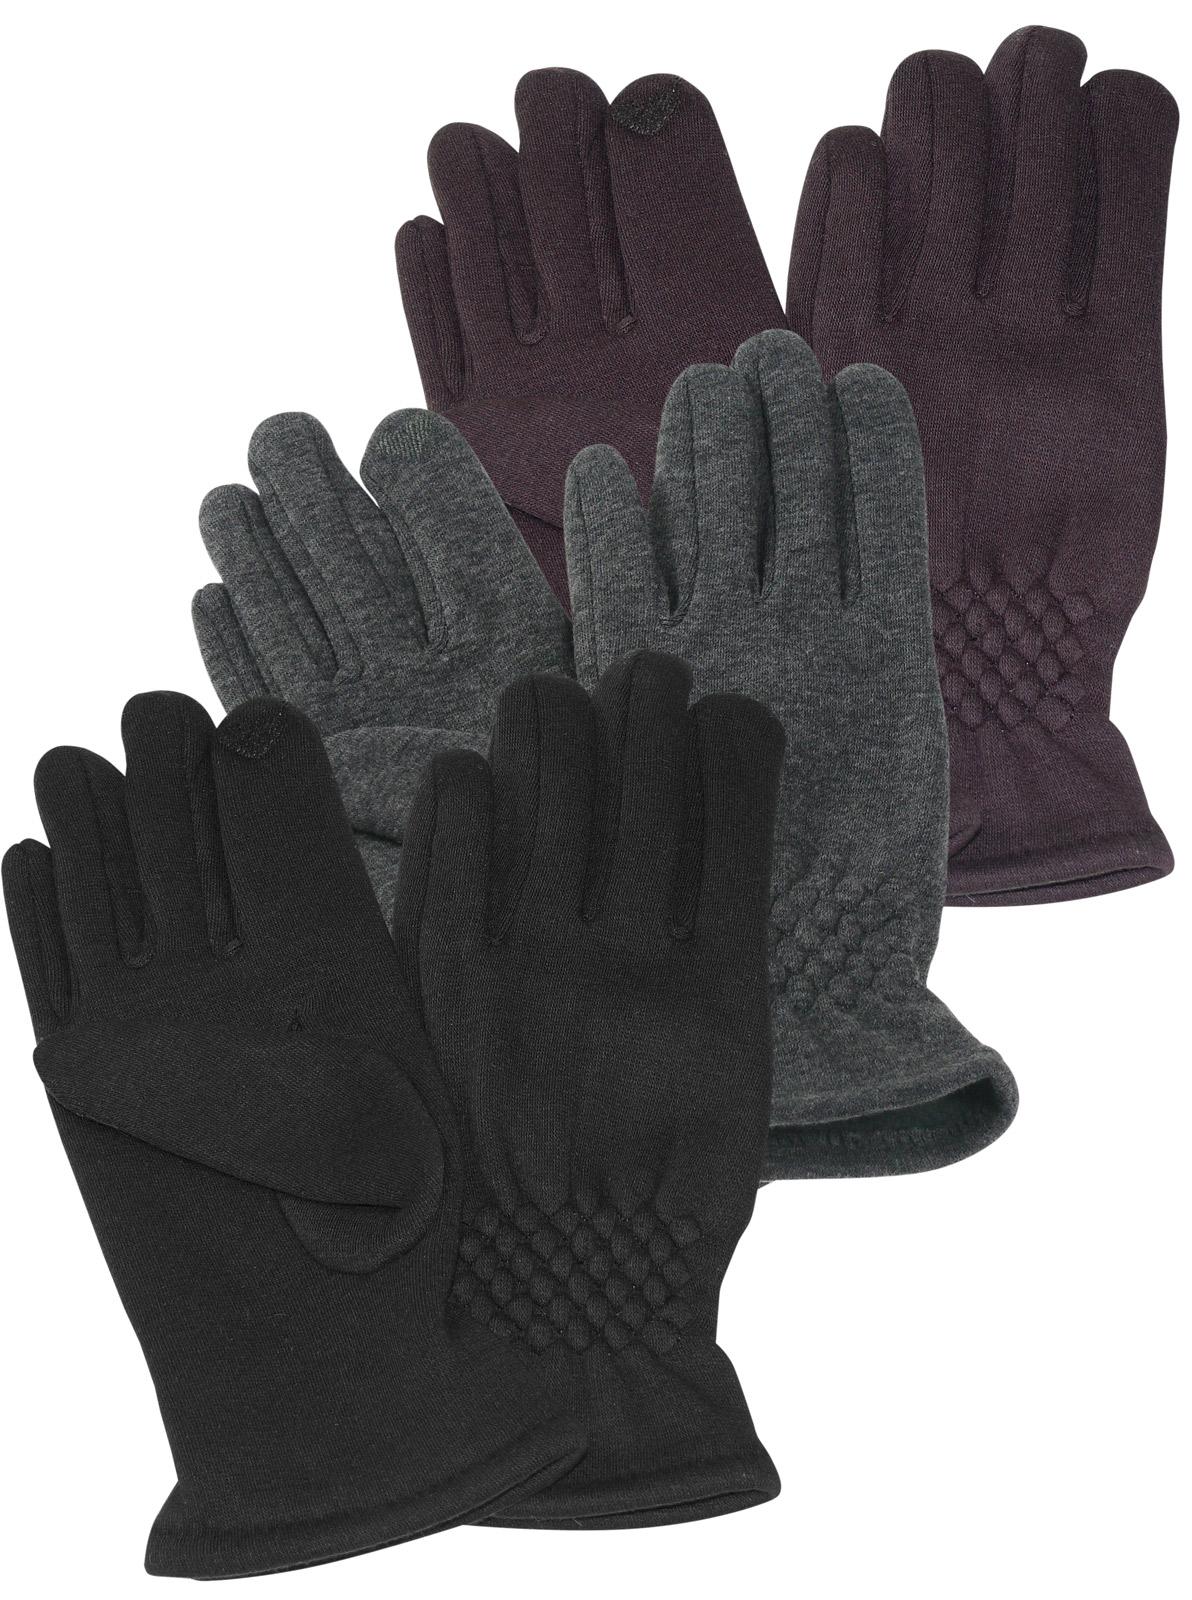 damen handschuh mit touch funktion 3 farben accessoires handschuhe. Black Bedroom Furniture Sets. Home Design Ideas